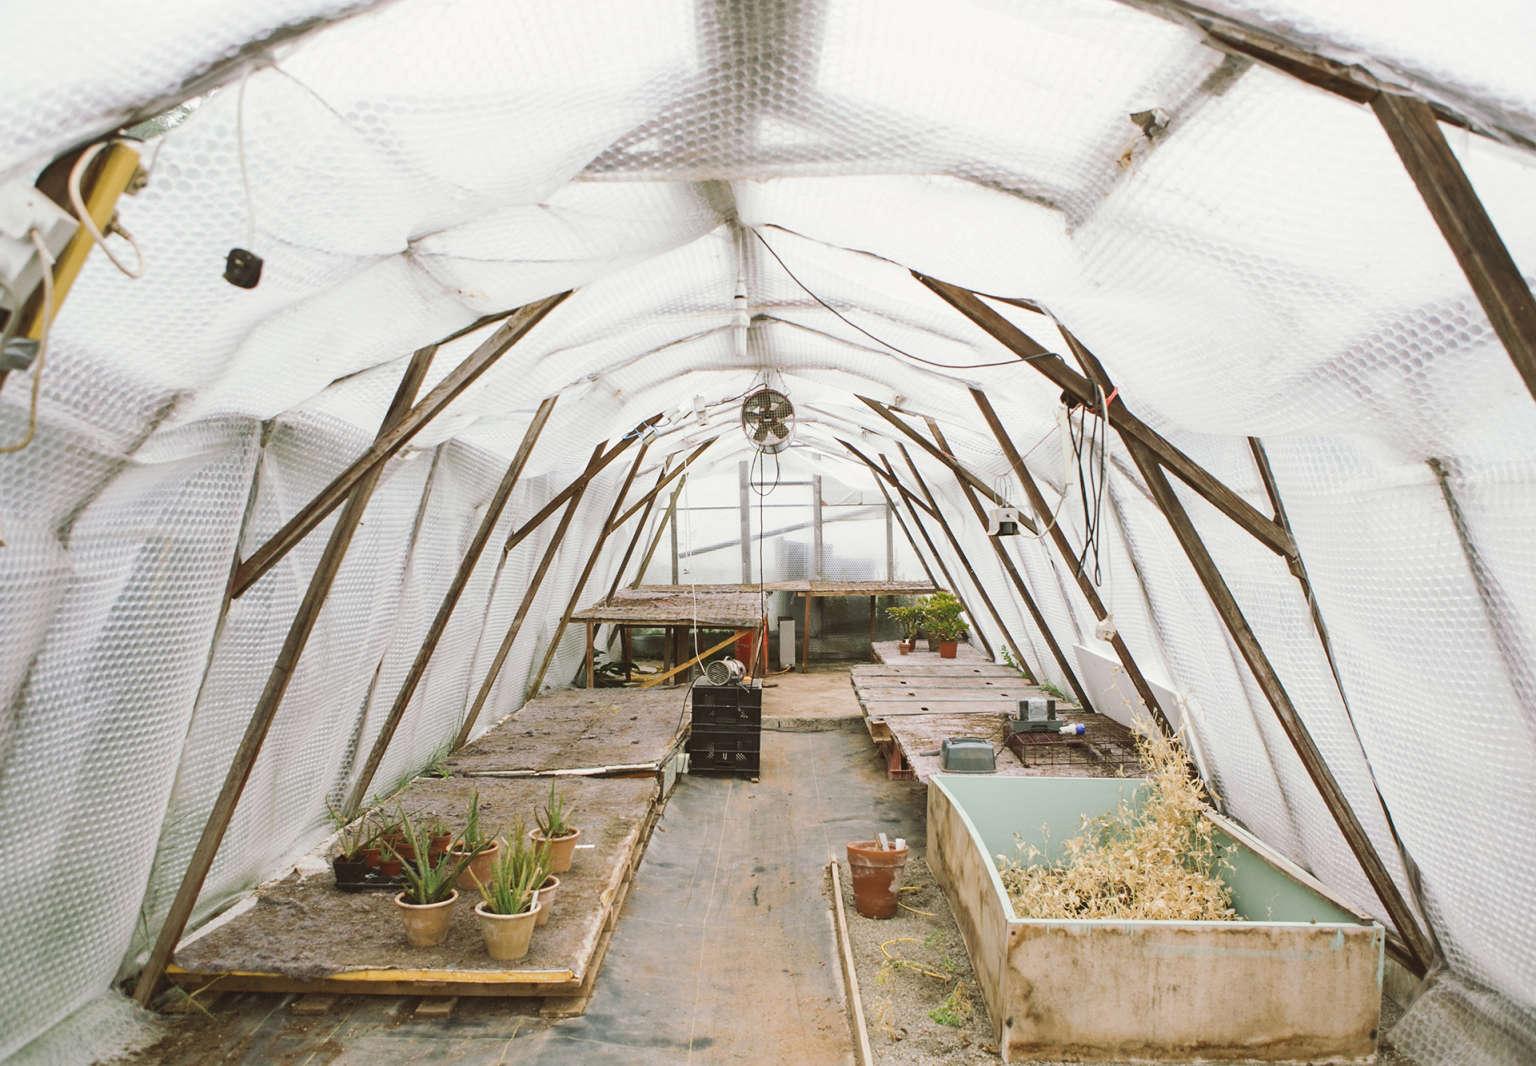 garden hack hoop house vervain growhouse india hurst gardenista